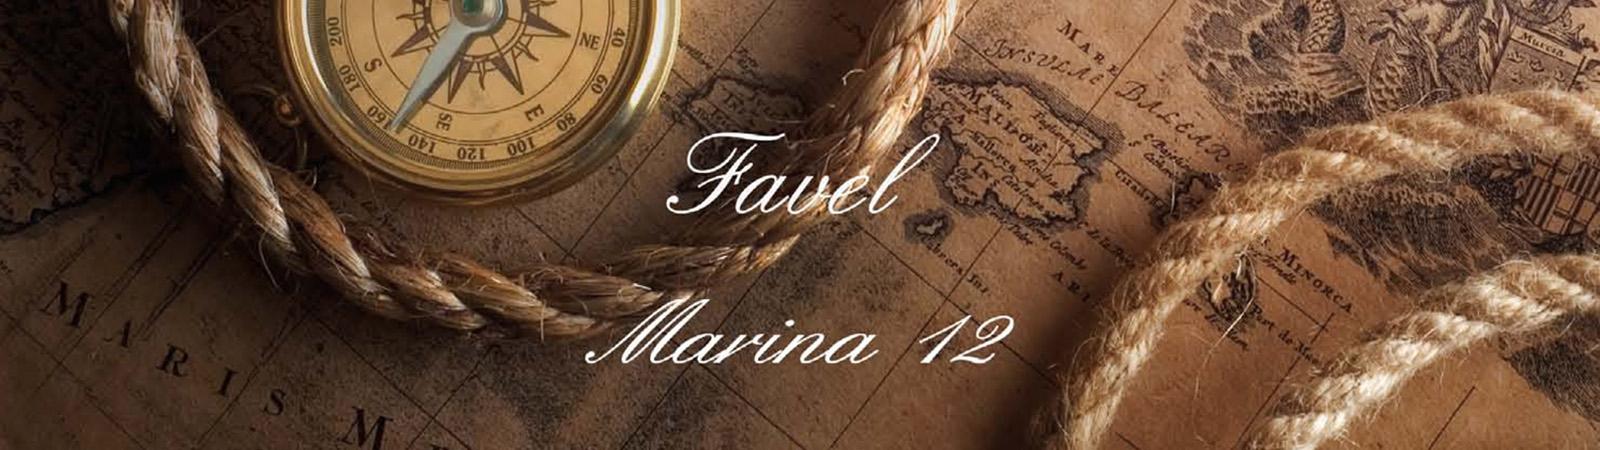 favel_marina12_particolare